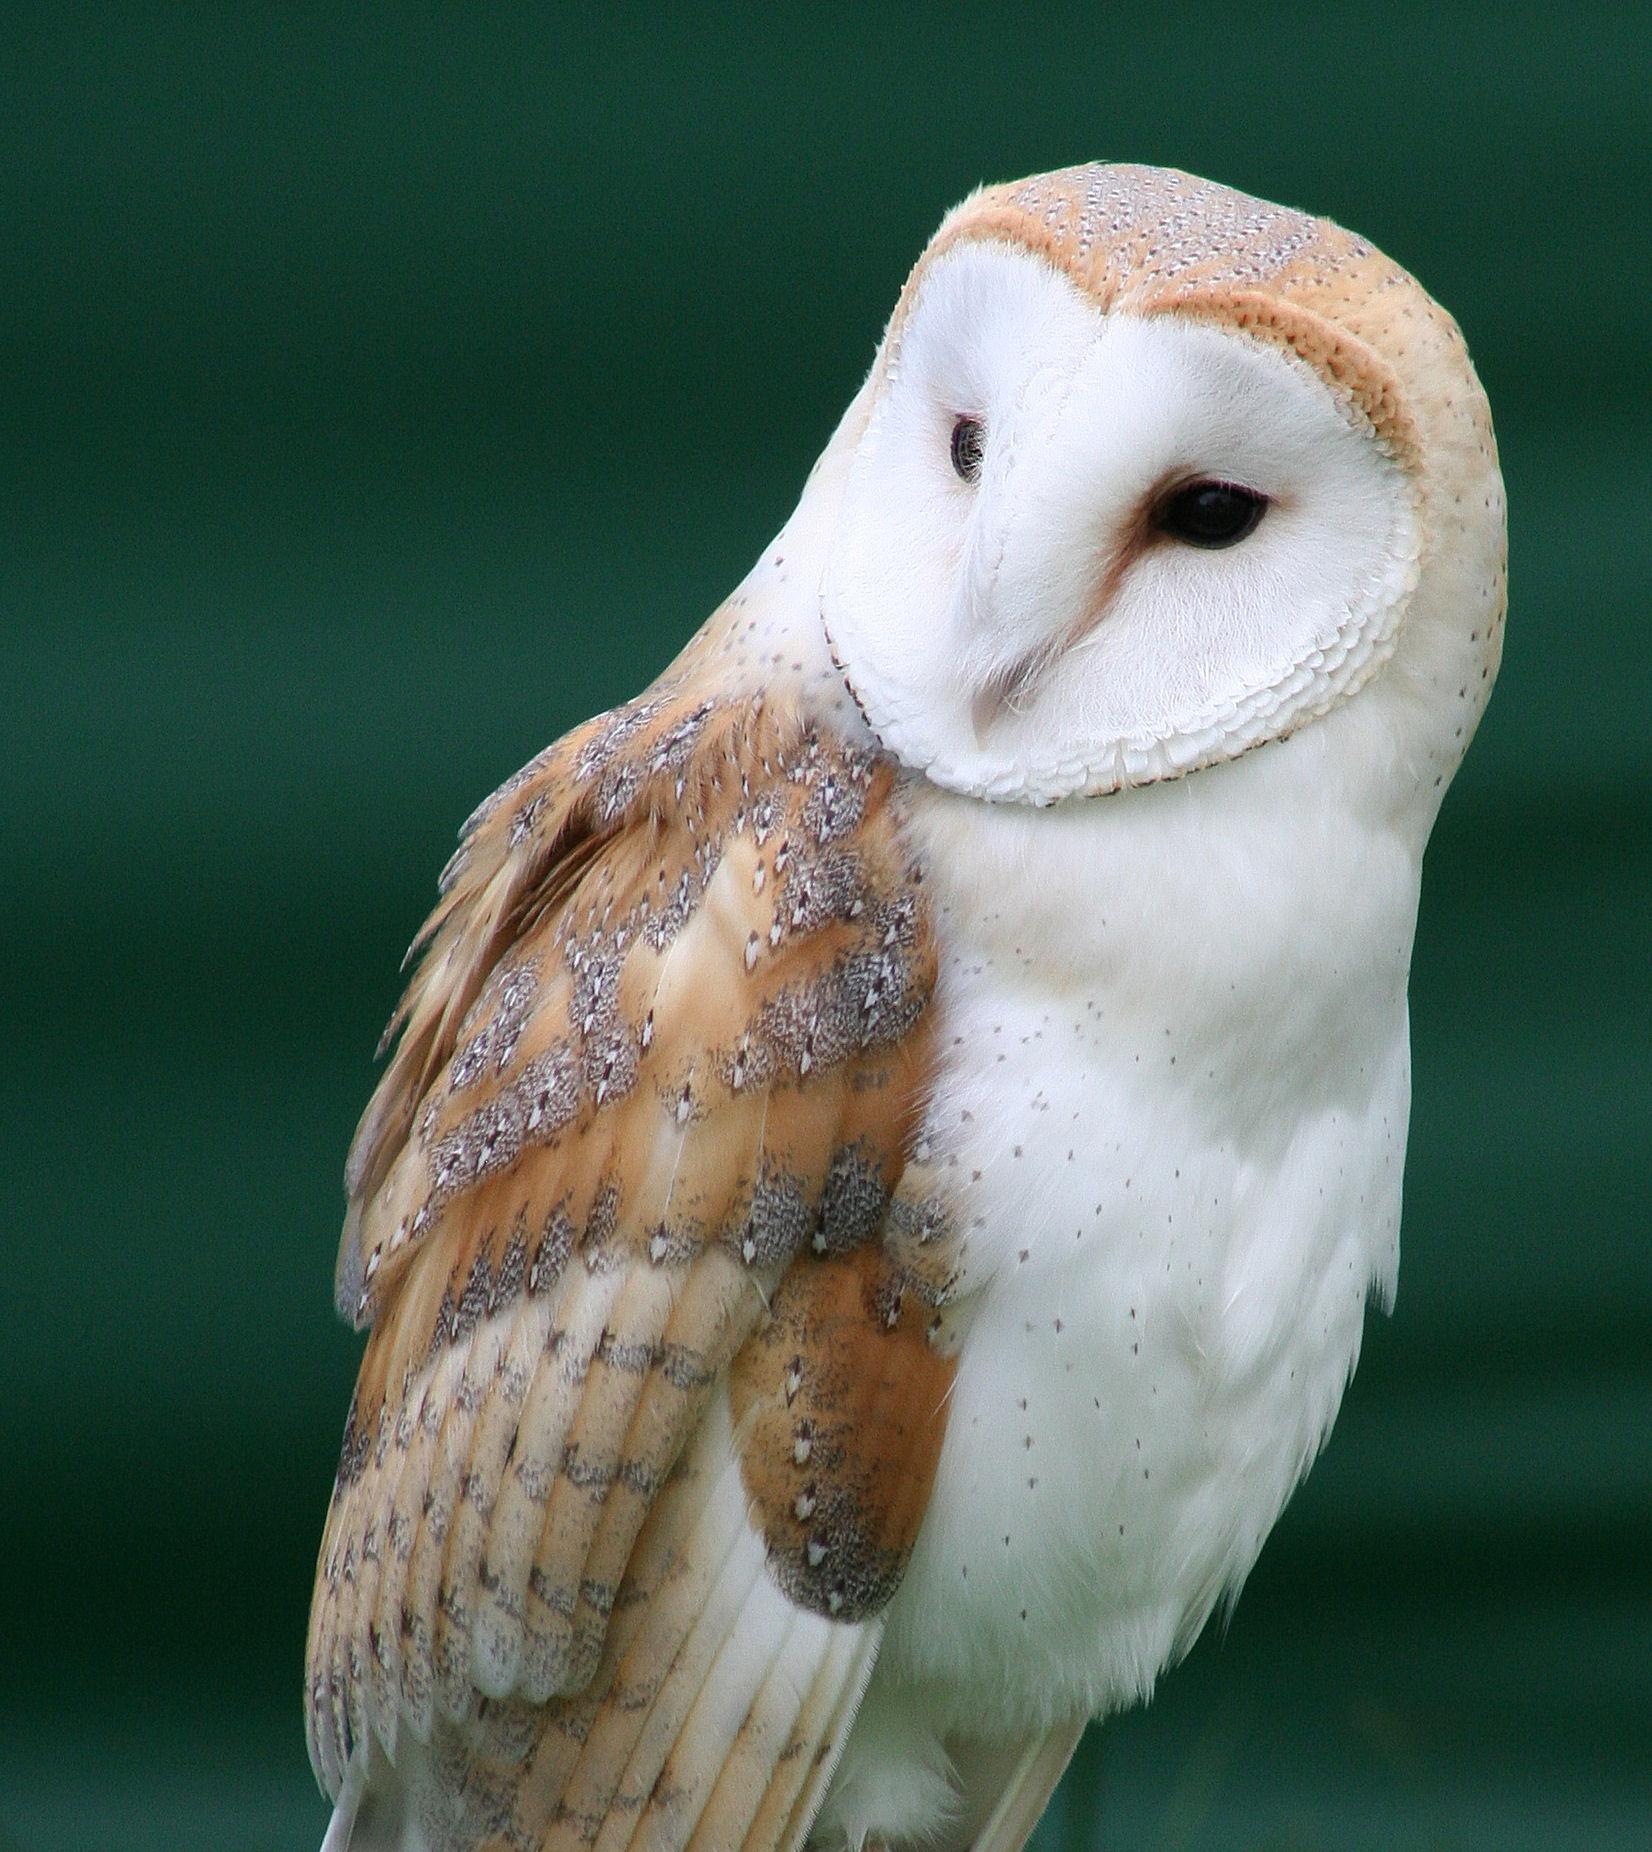 File:Tyto alba close up.jpg - Wikipedia